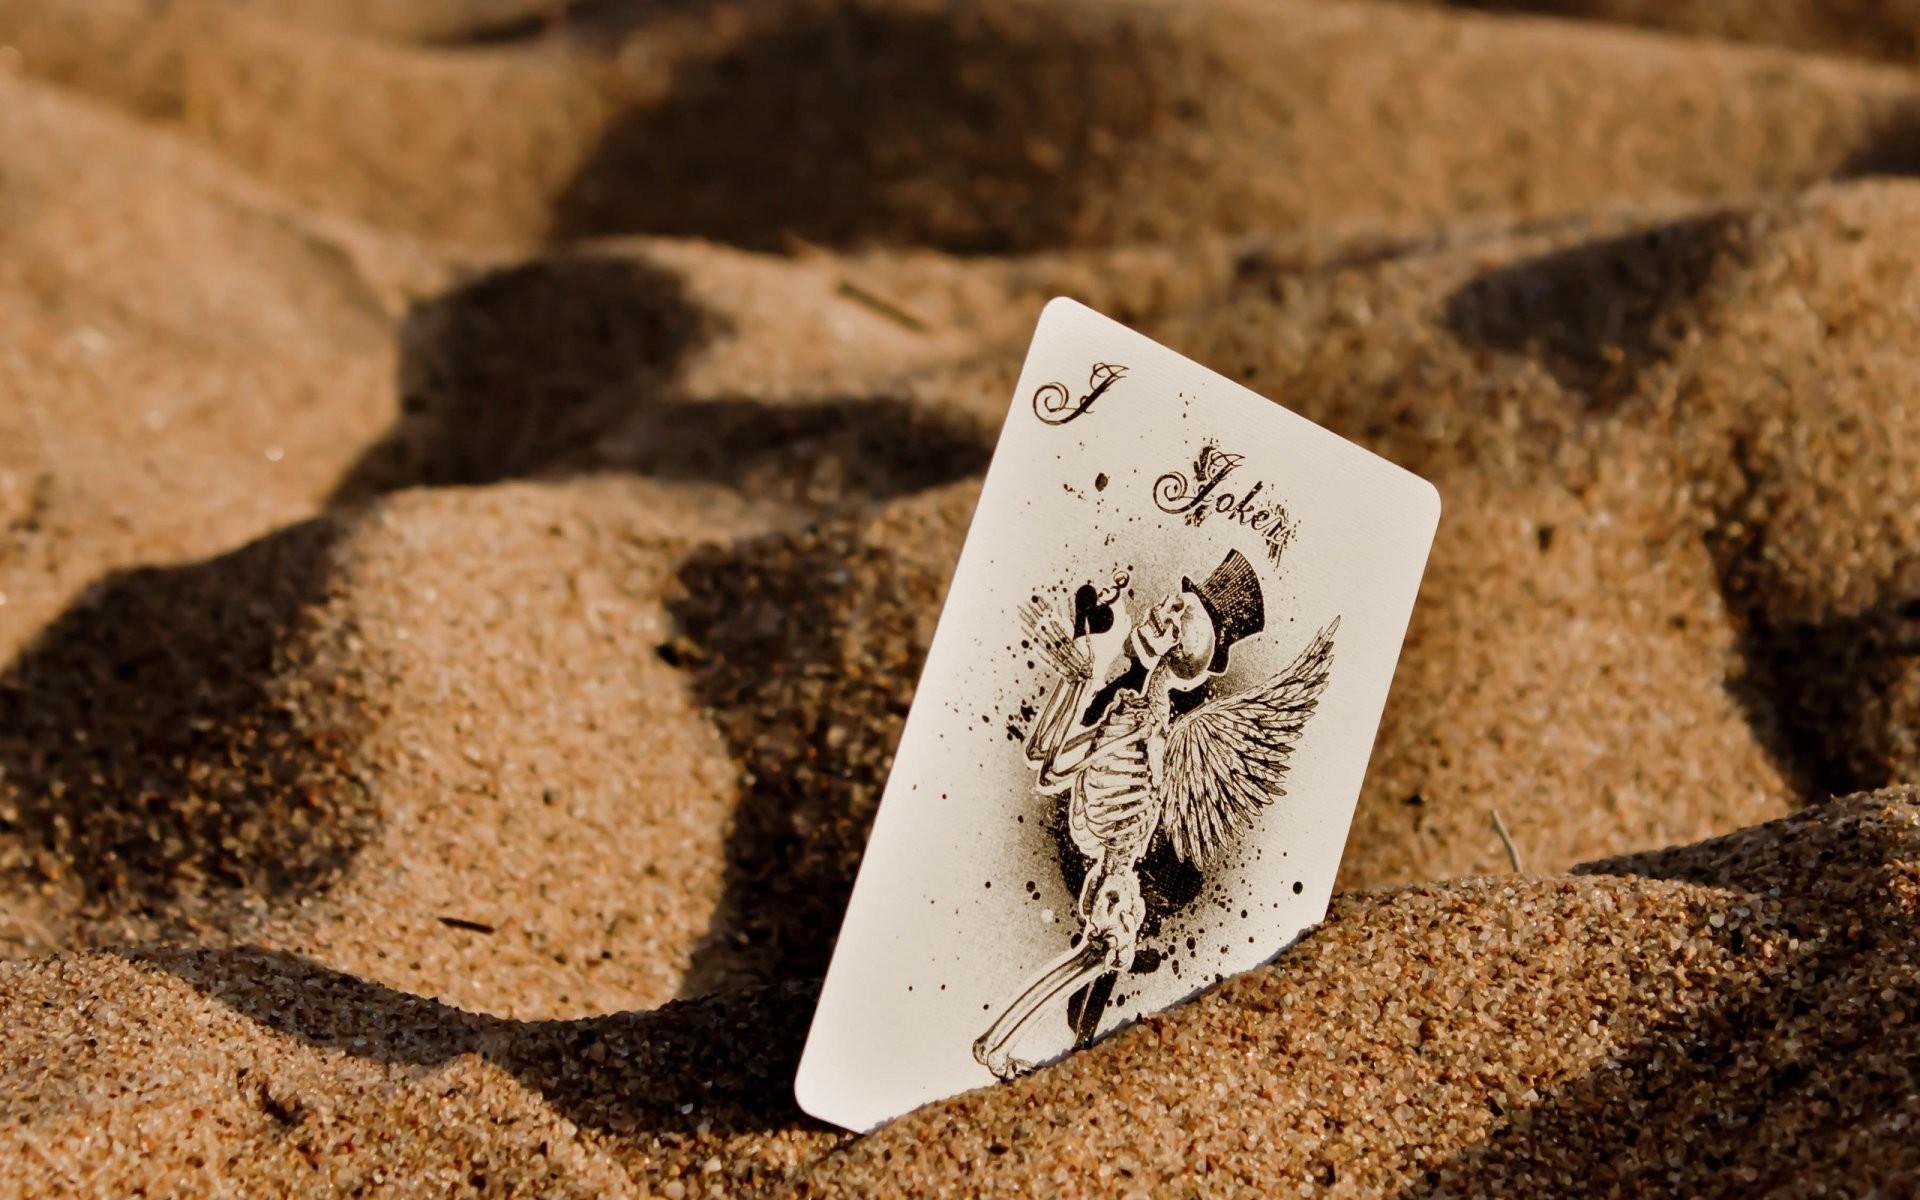 Joker Card Wallpapers (66+ images)